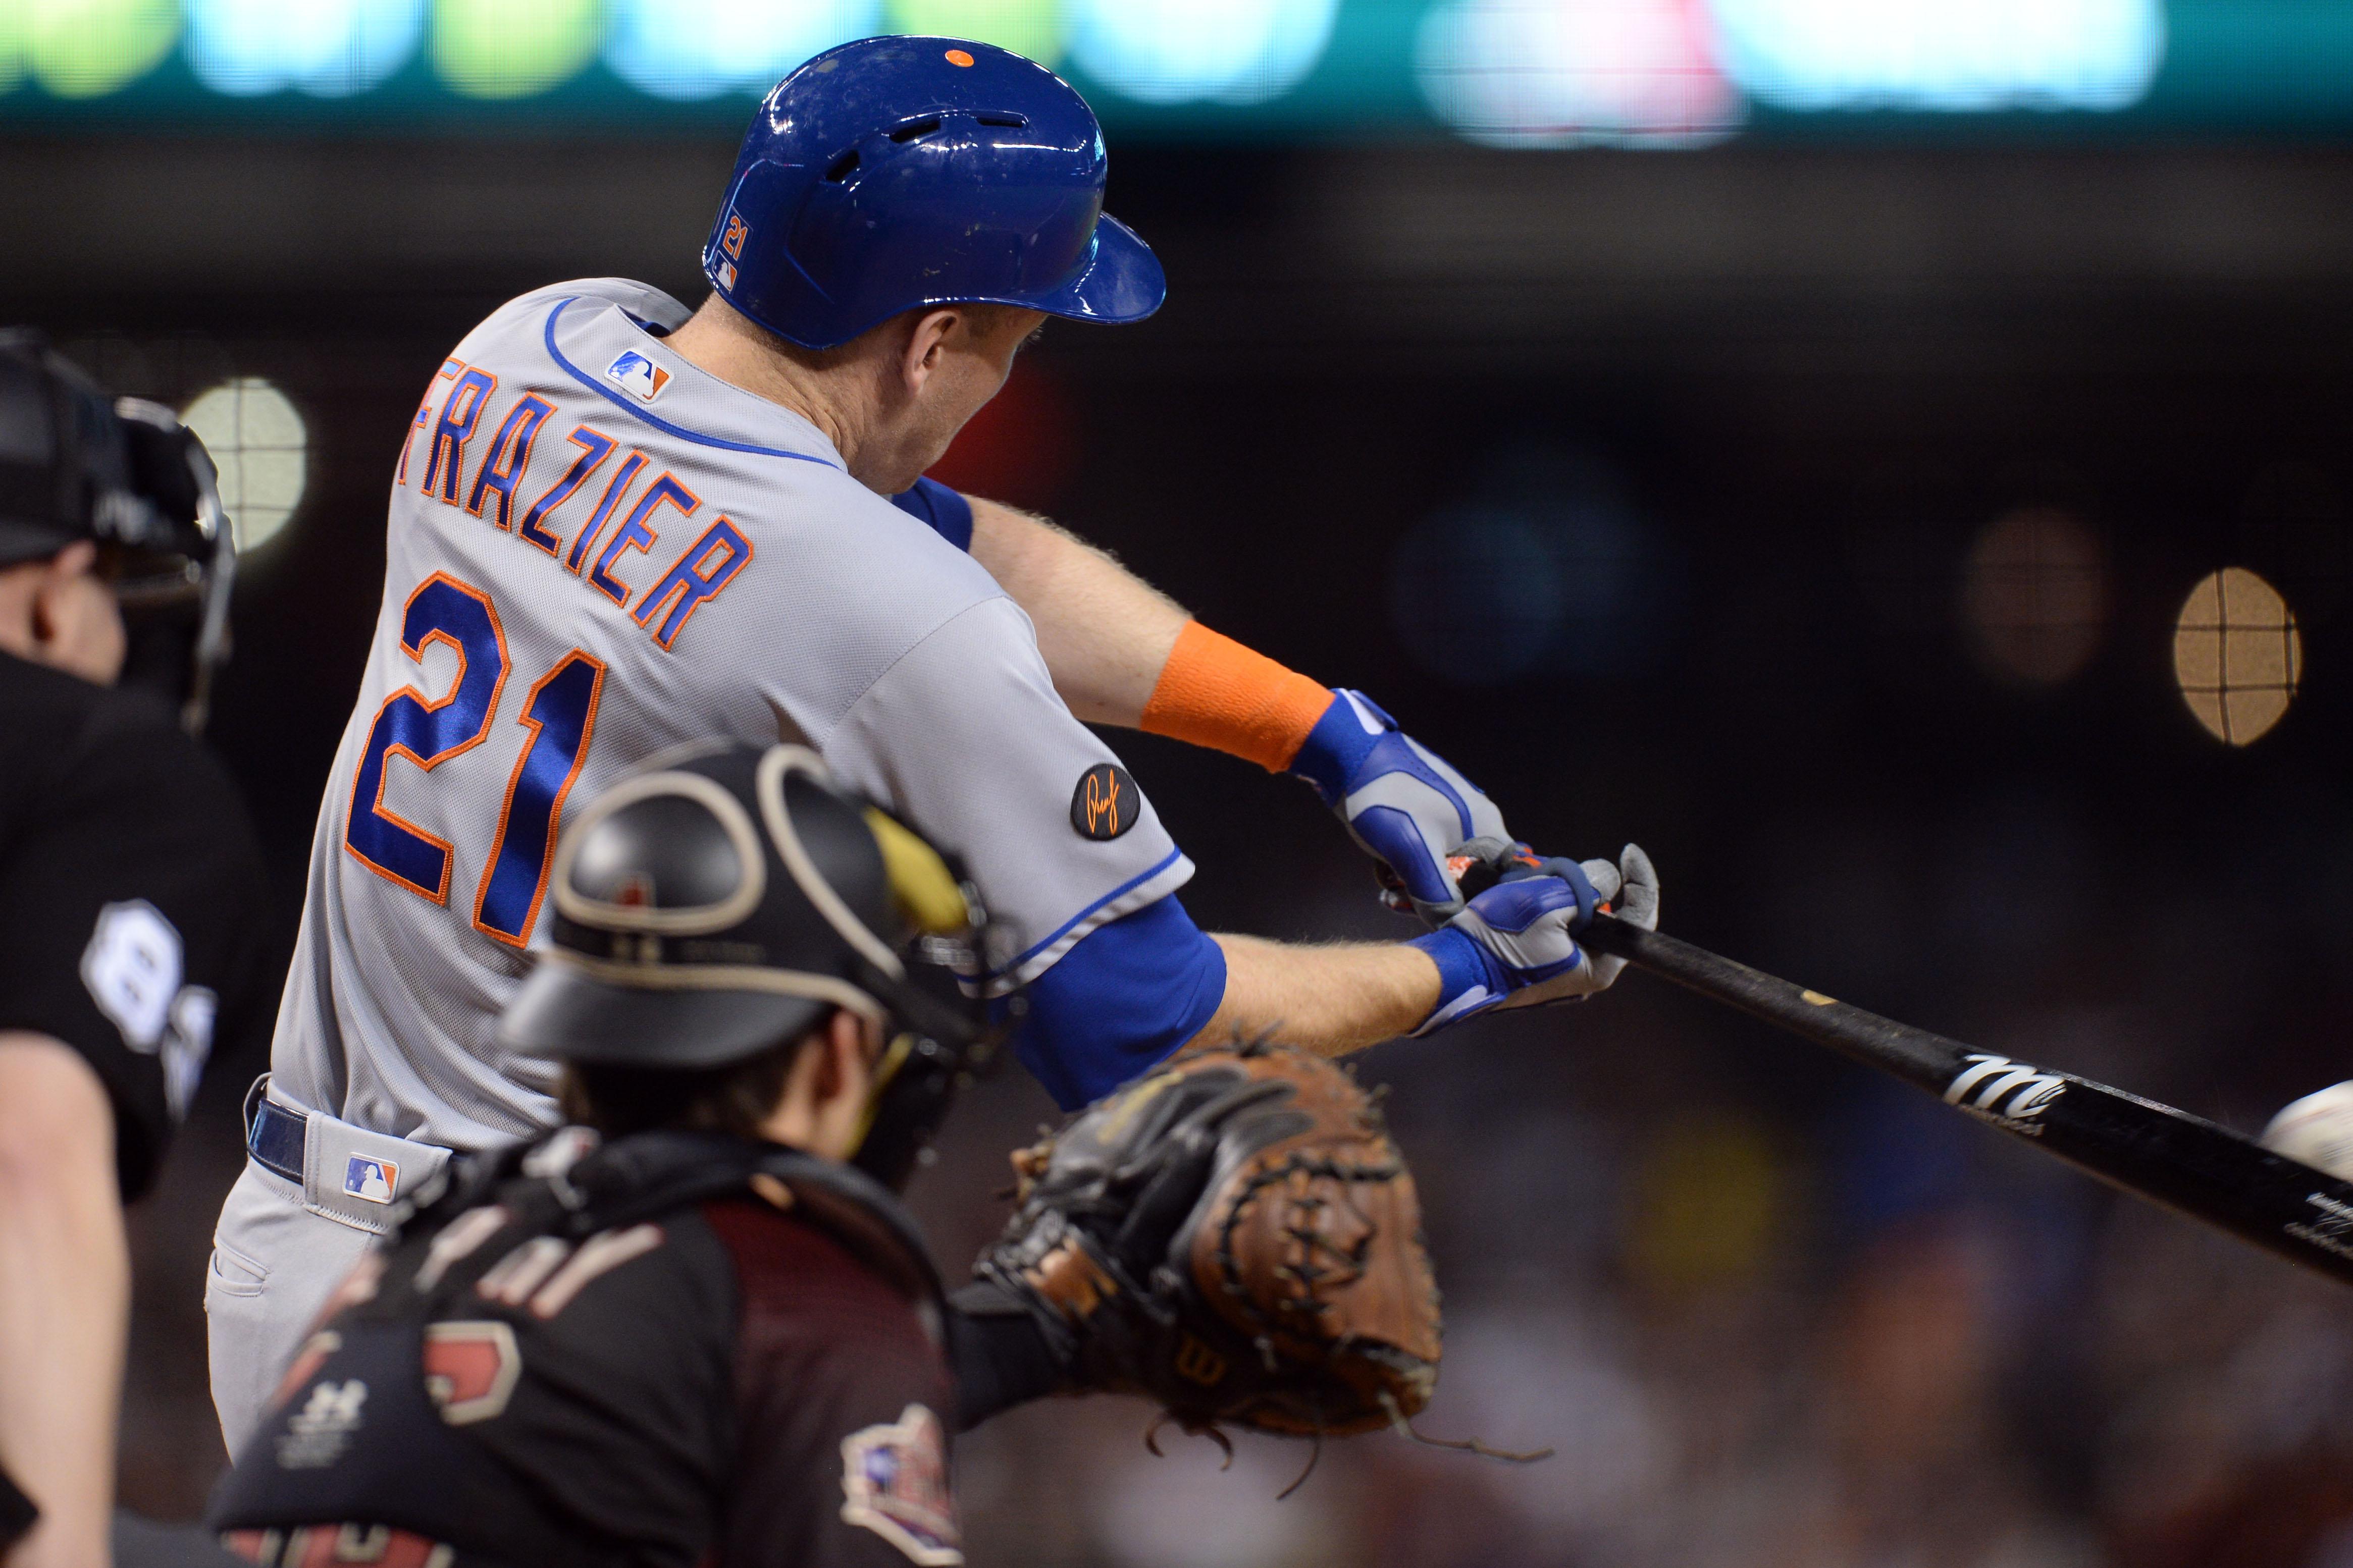 6/17/18 Game Preview: New York Mets at Arizona Diamondbacks